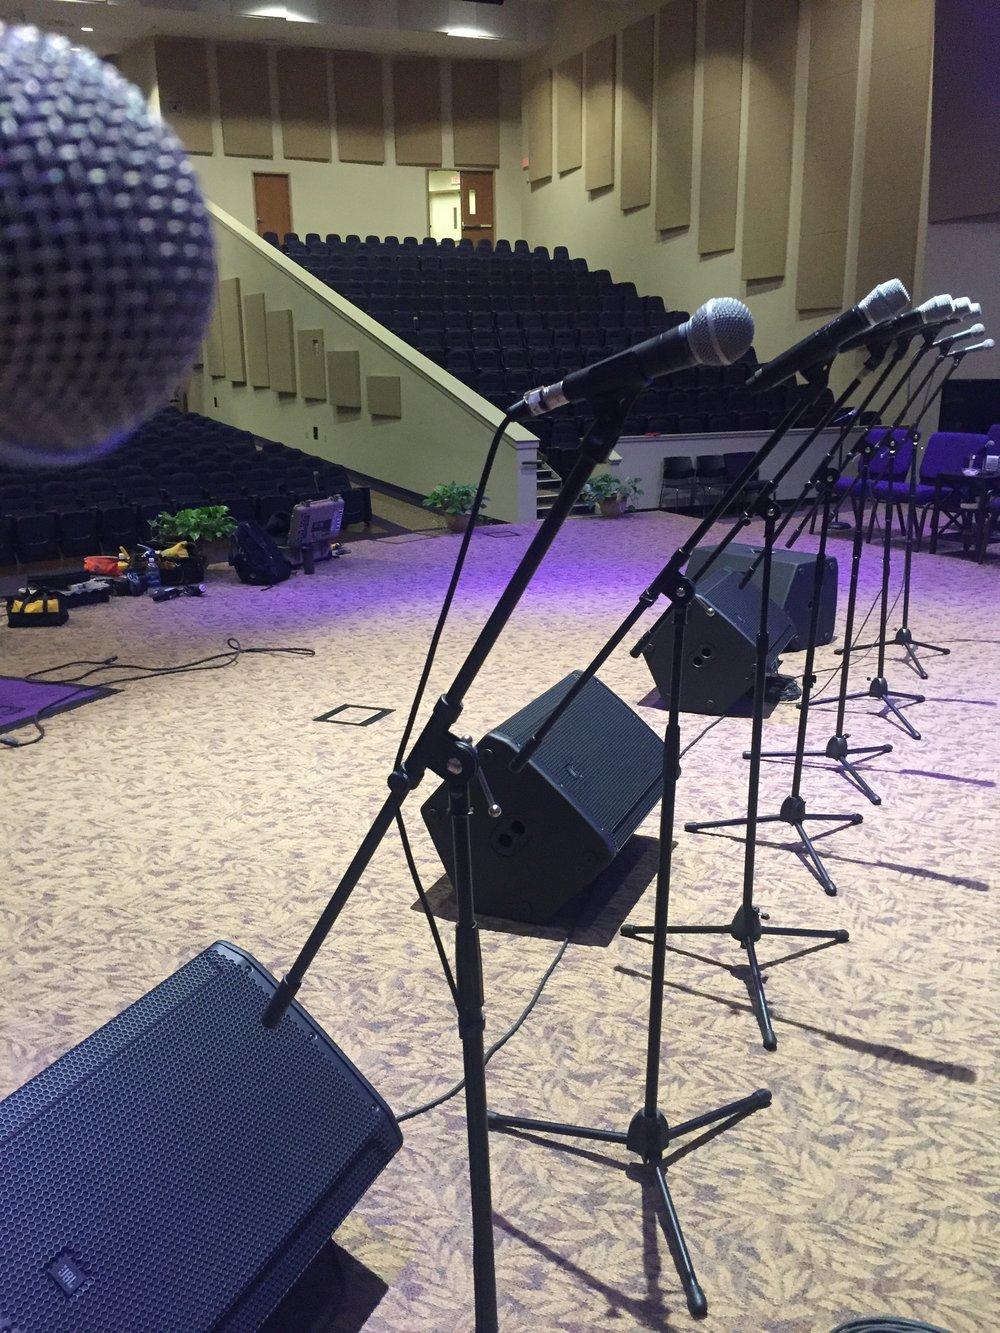 house_of_worship_avl, church_audio_video, church_av_installers